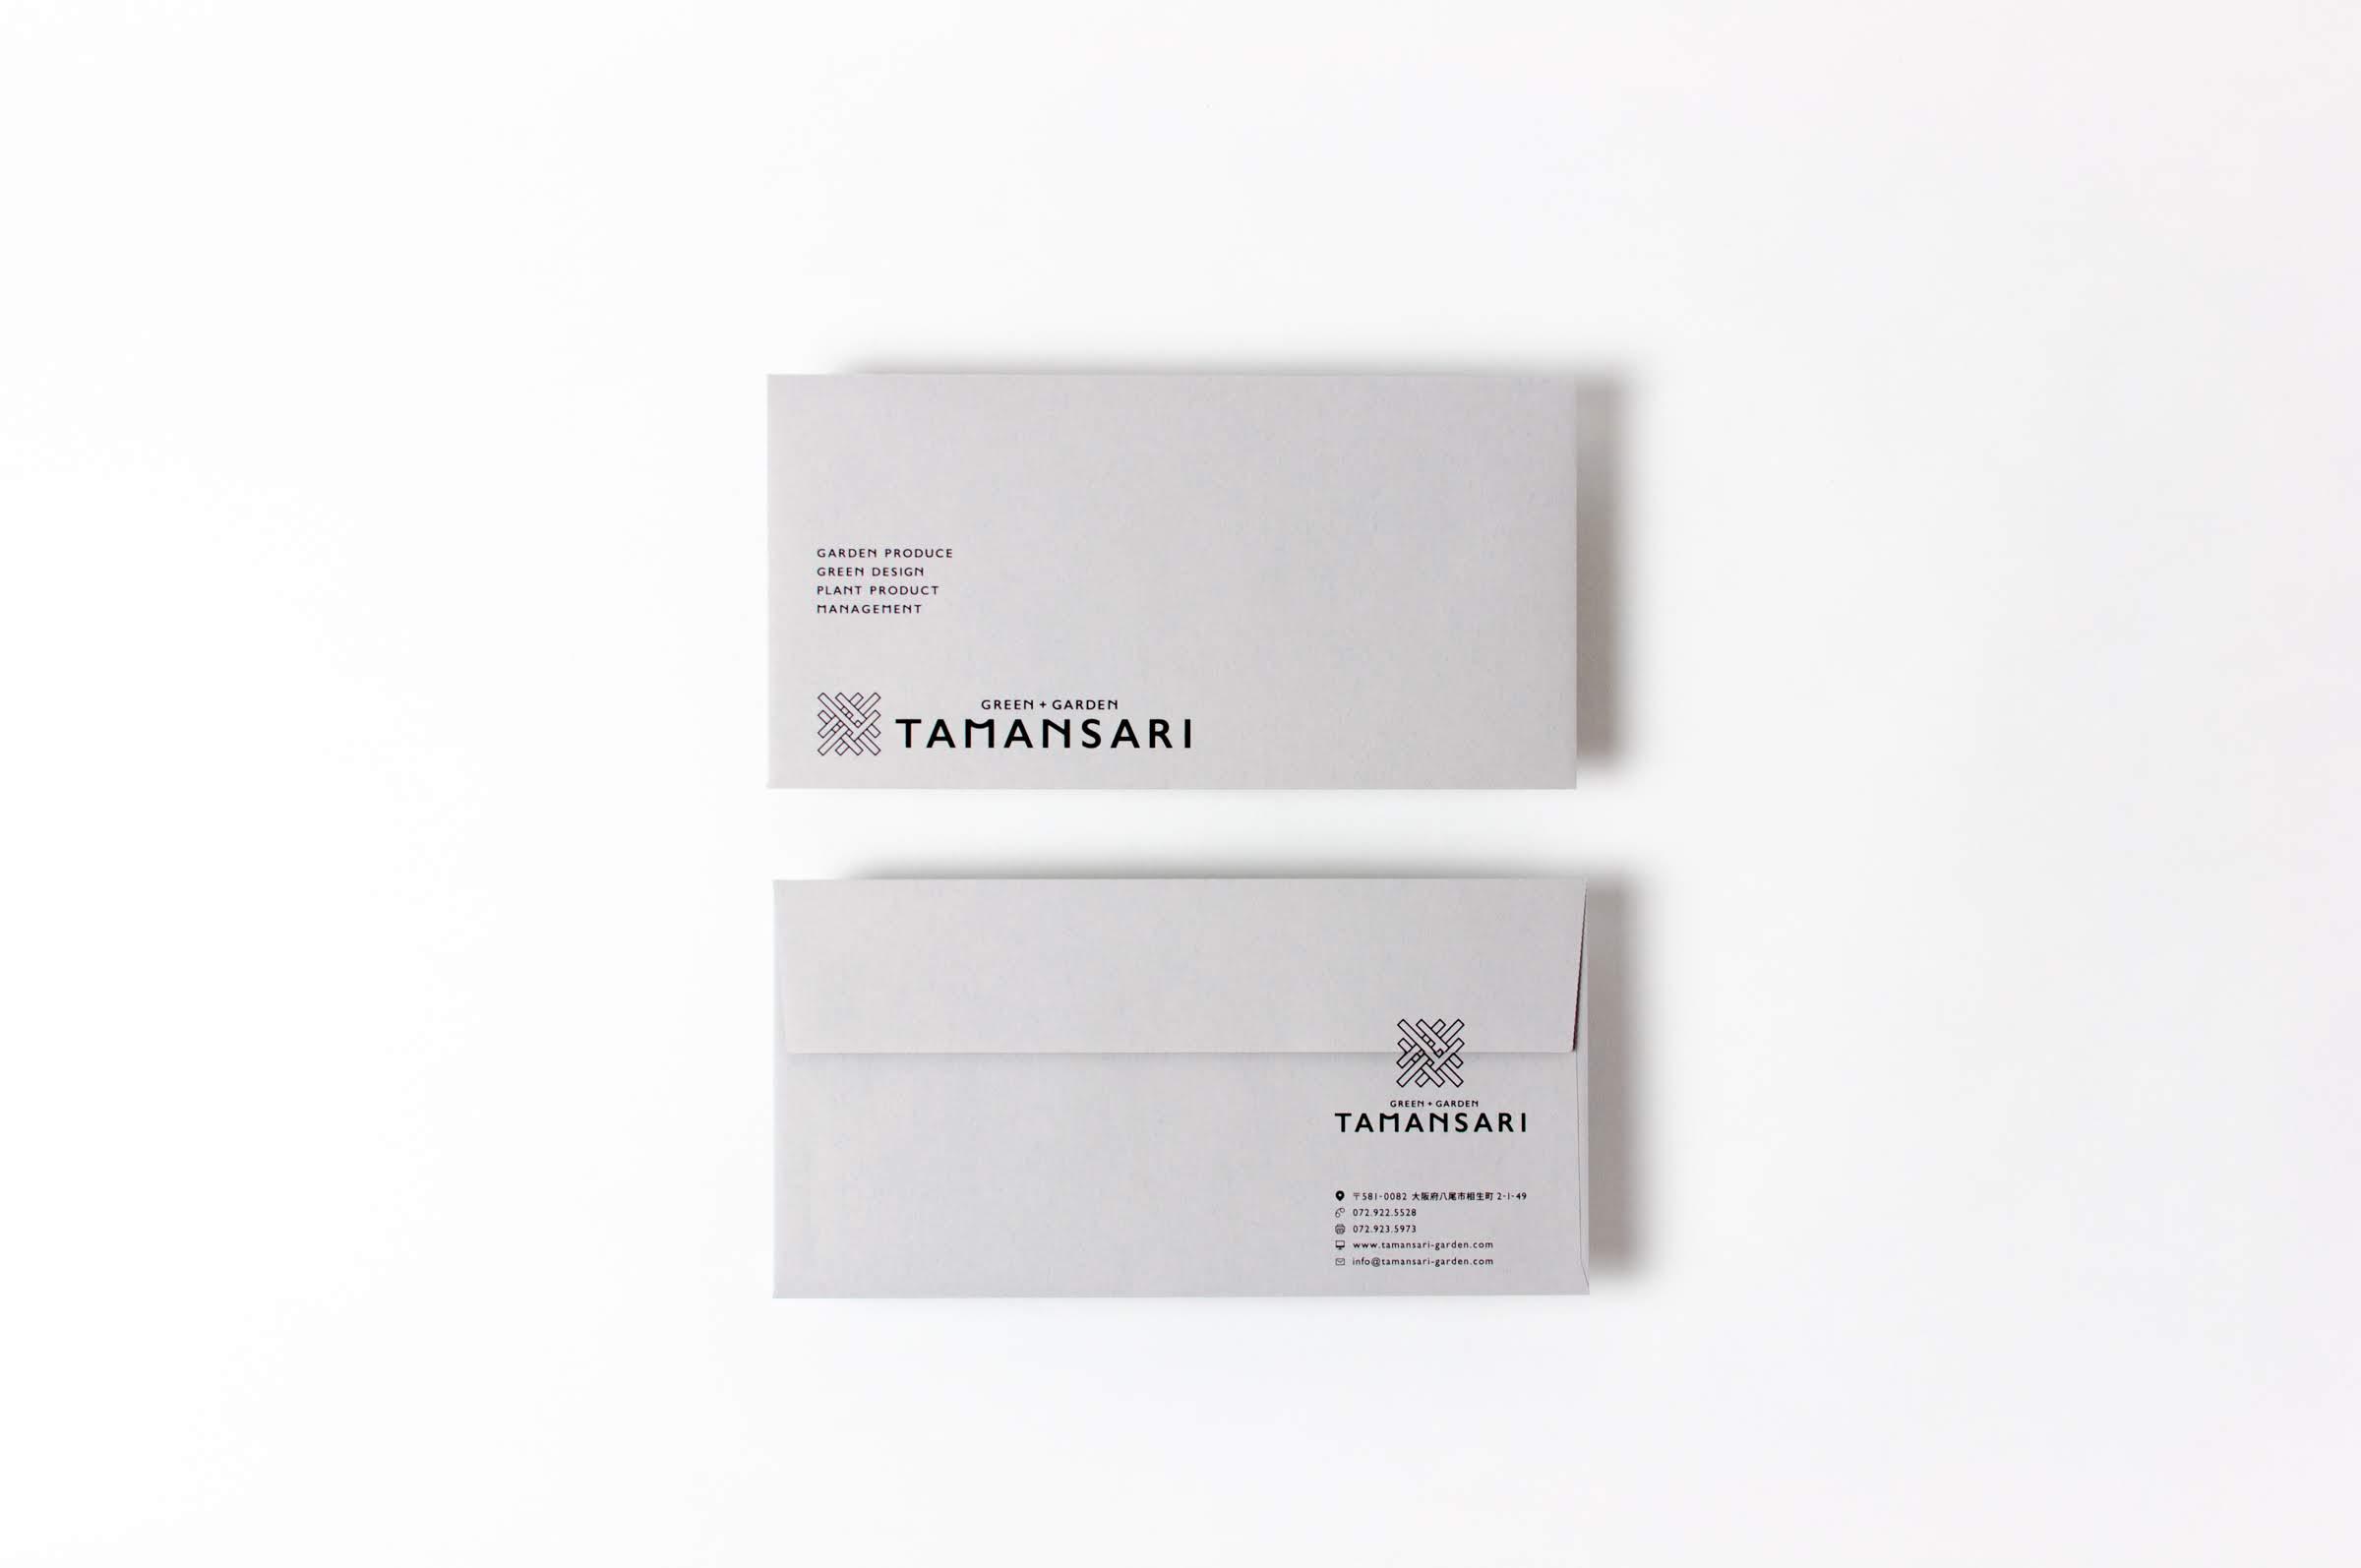 GREEN+GARDEN TAMANSARI|ENVELOPE